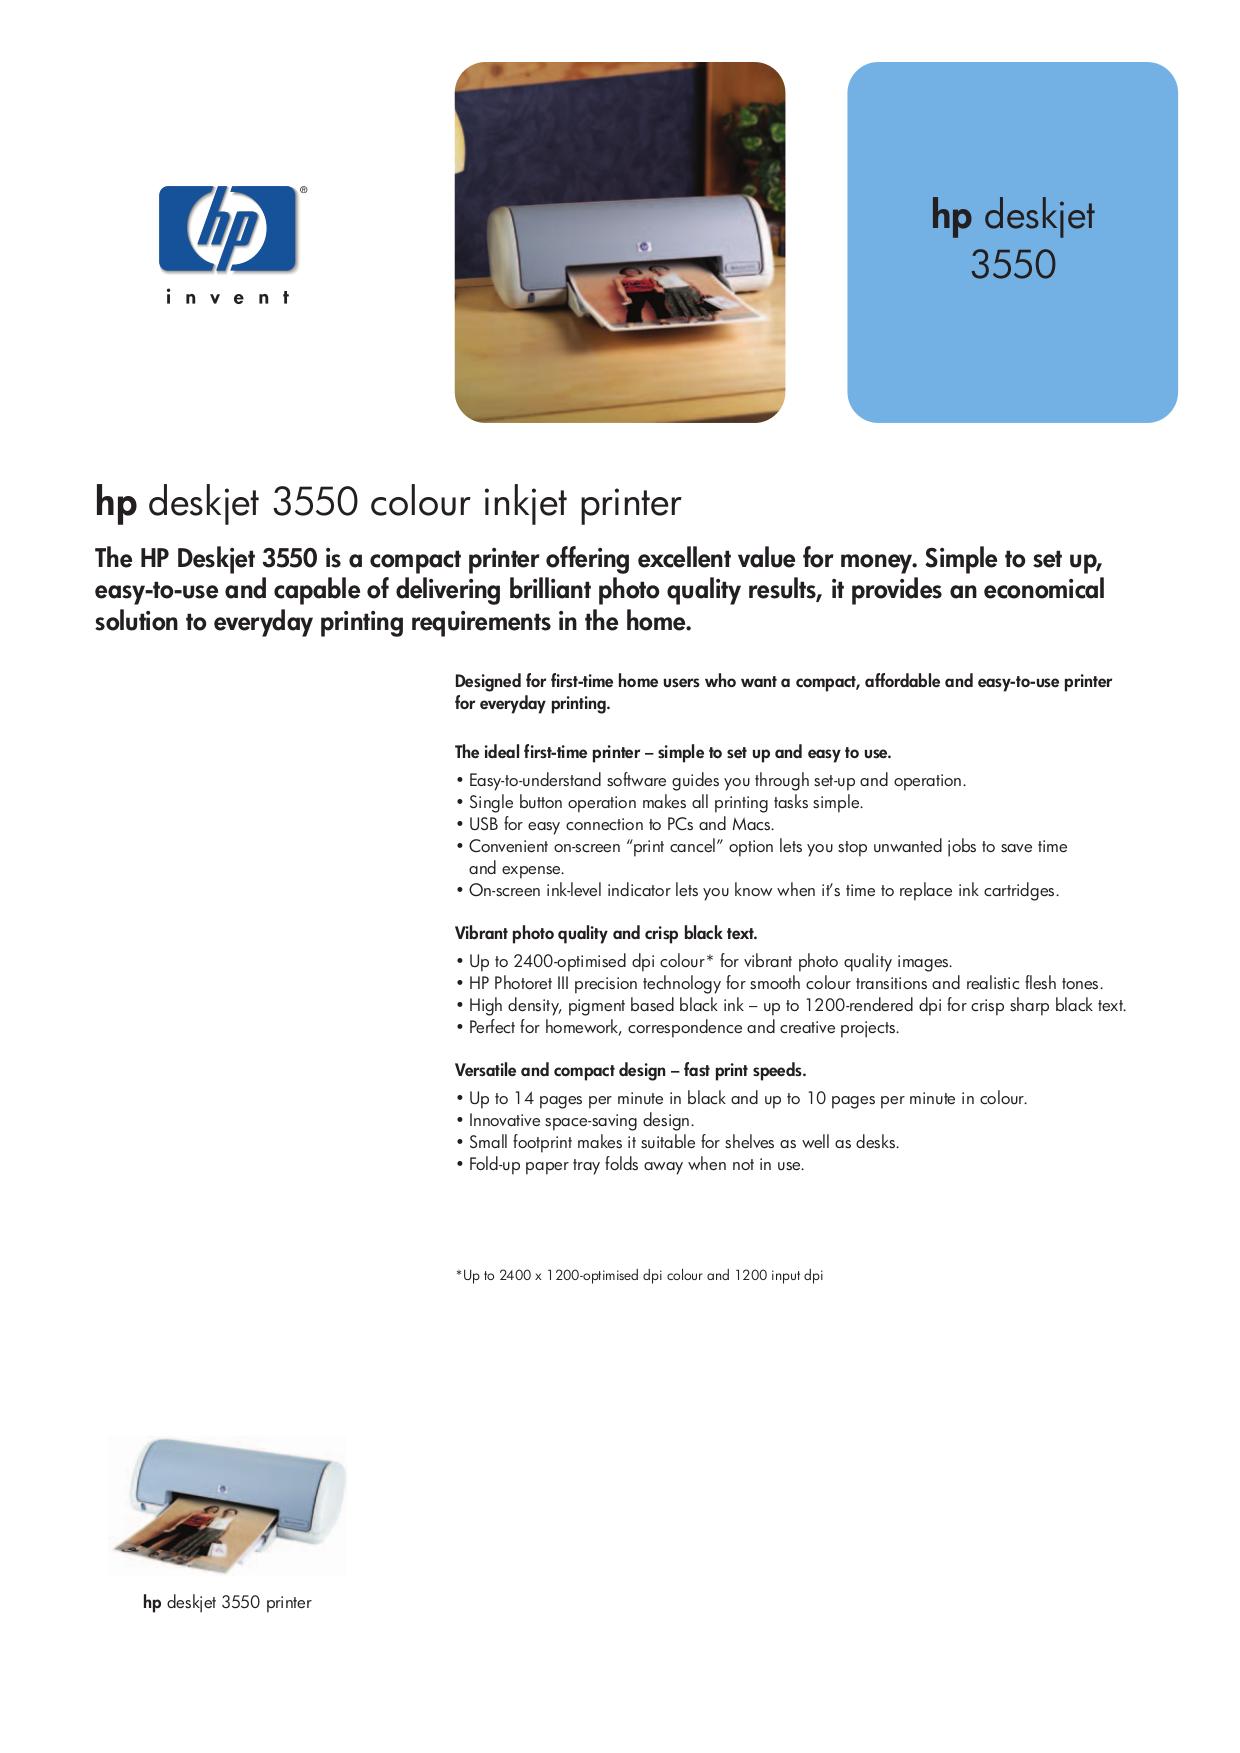 download free pdf for hp deskjet 3550 printer manual rh umlib com hp deskjet 3550 service manual pdf hp deskjet 3550 user manual